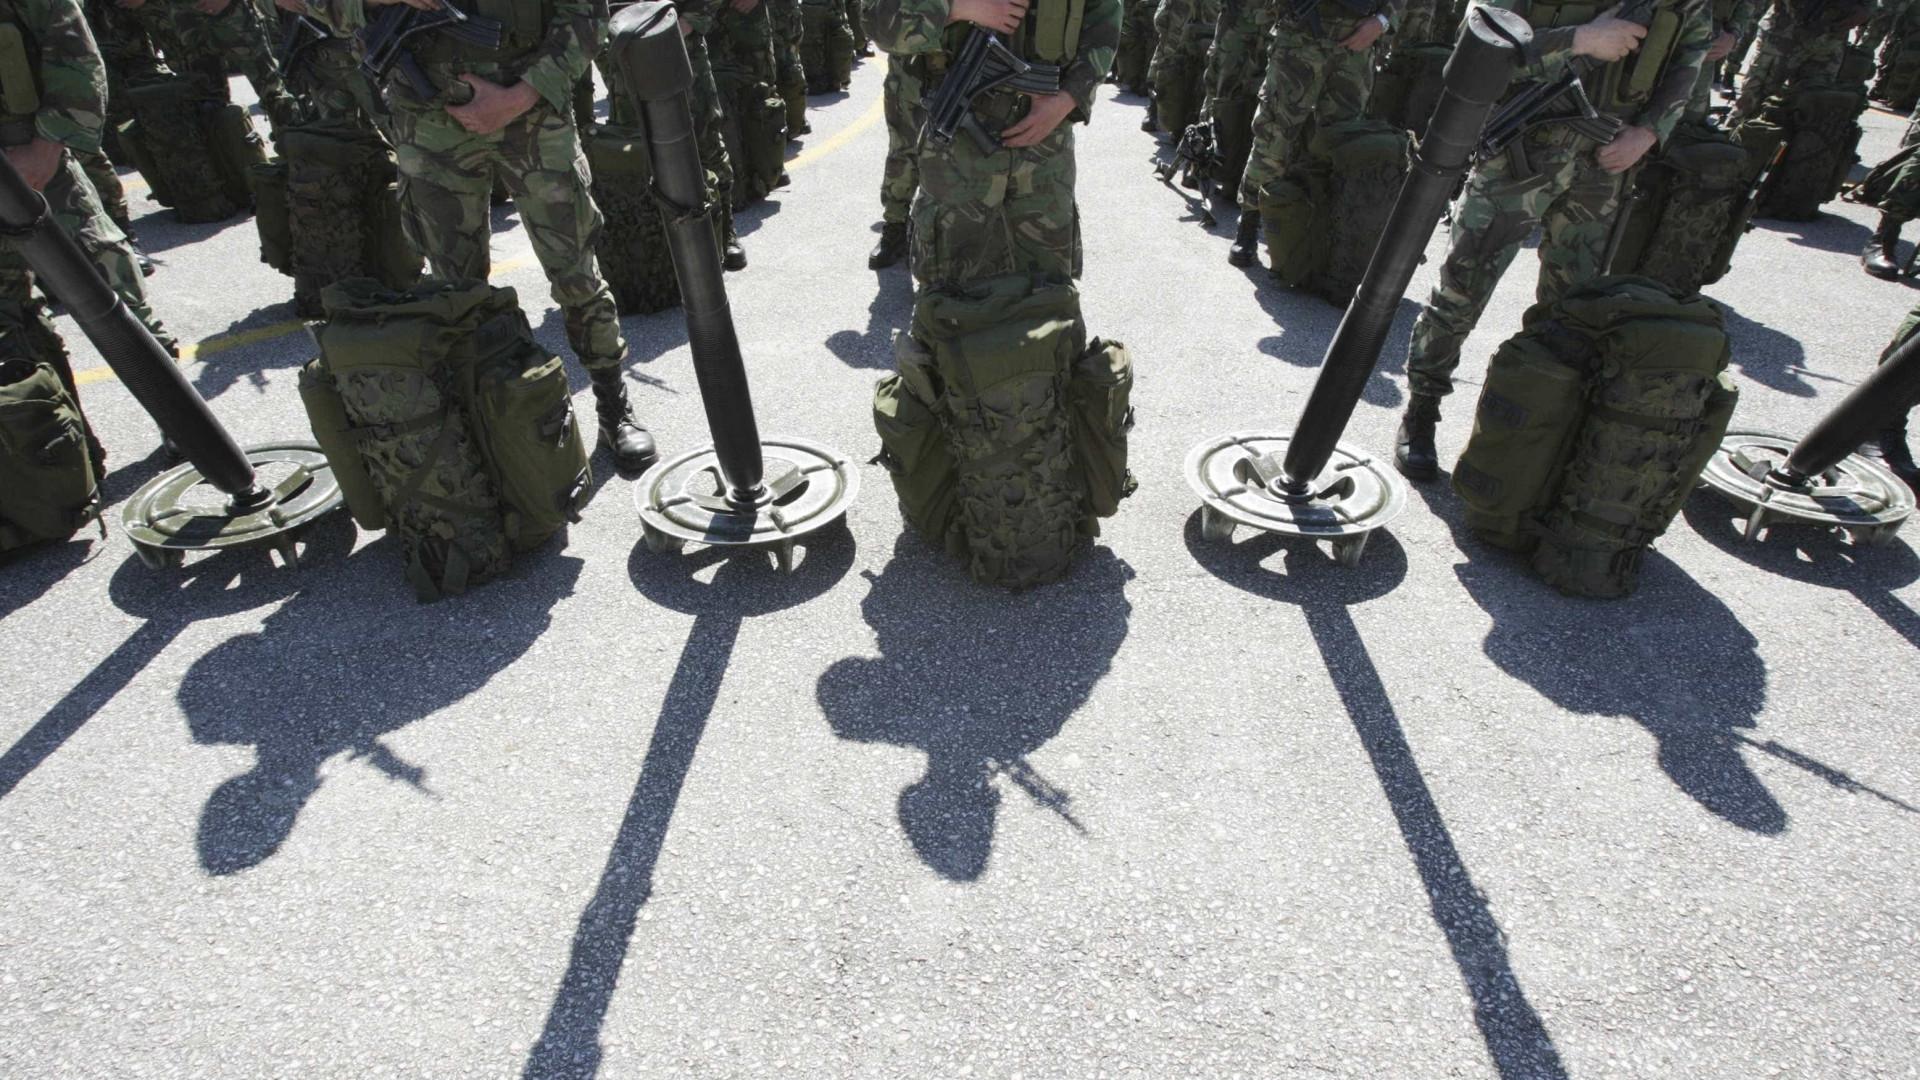 Chefe do Exército volta a nomear comandantes exonerados